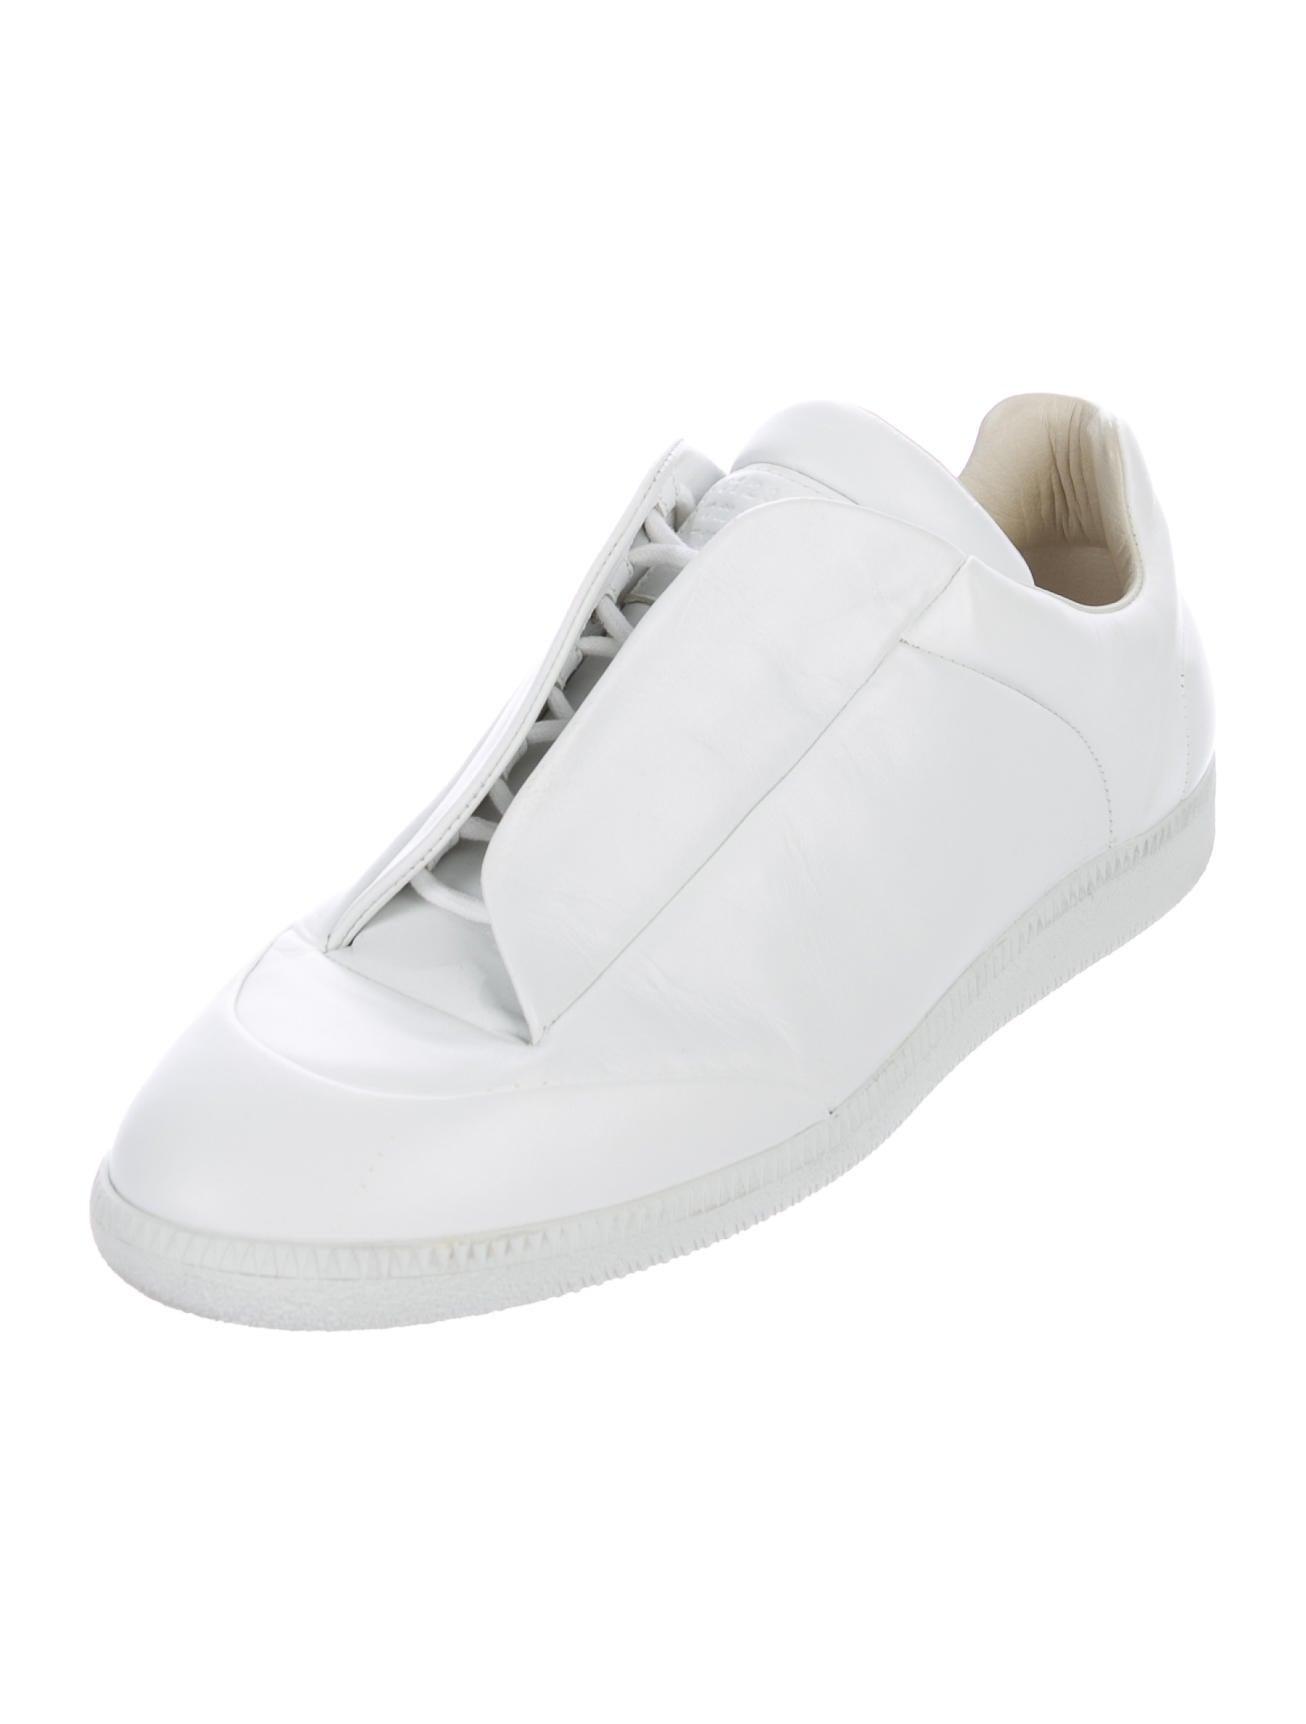 maison margiela future leather sneakers shoes mai30740 the realreal. Black Bedroom Furniture Sets. Home Design Ideas